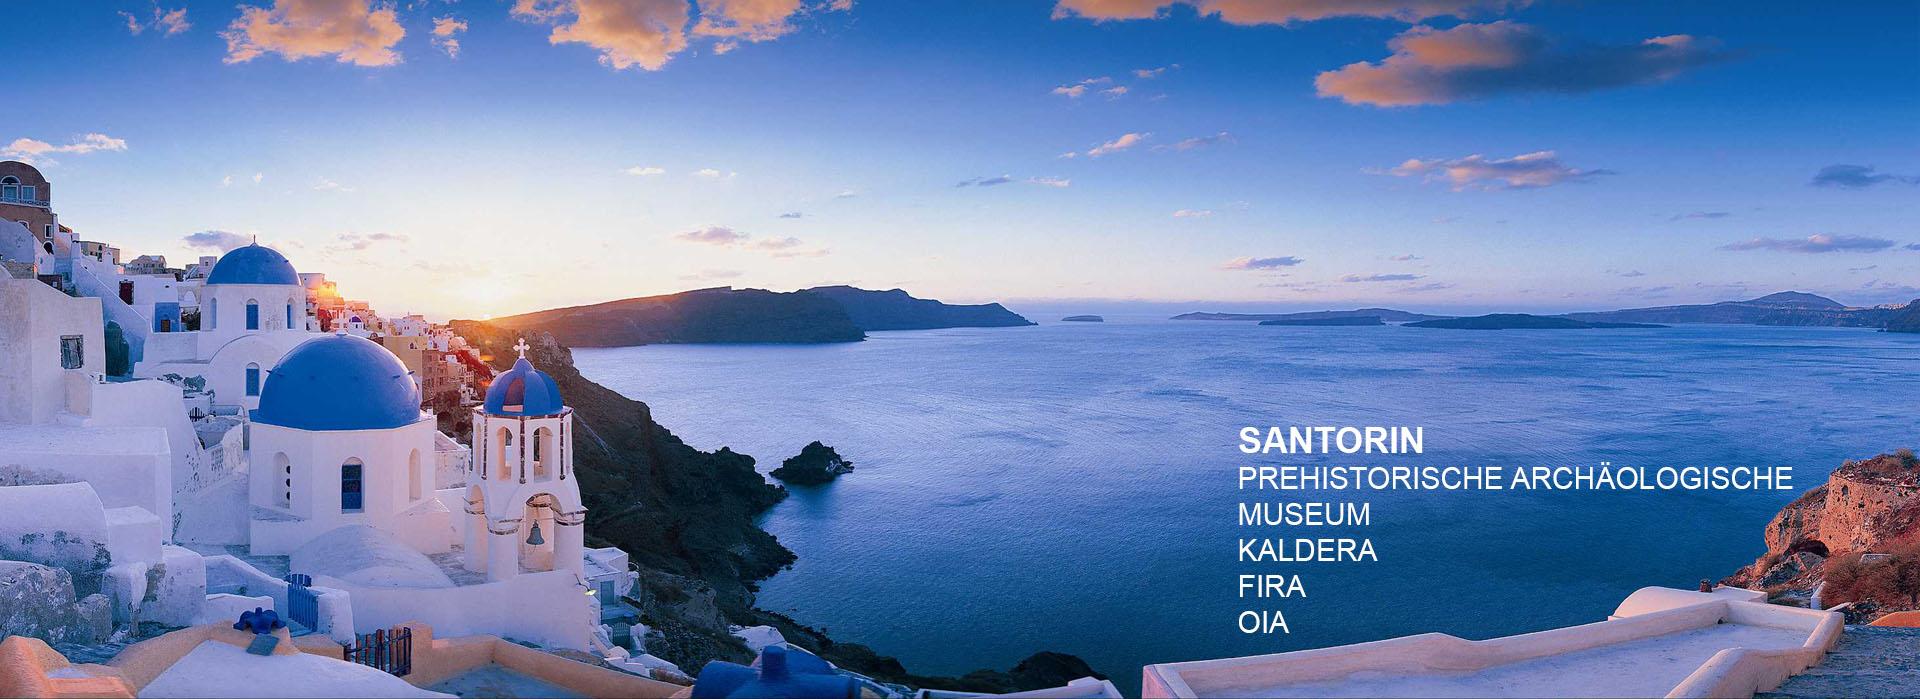 santorini-banner-DE